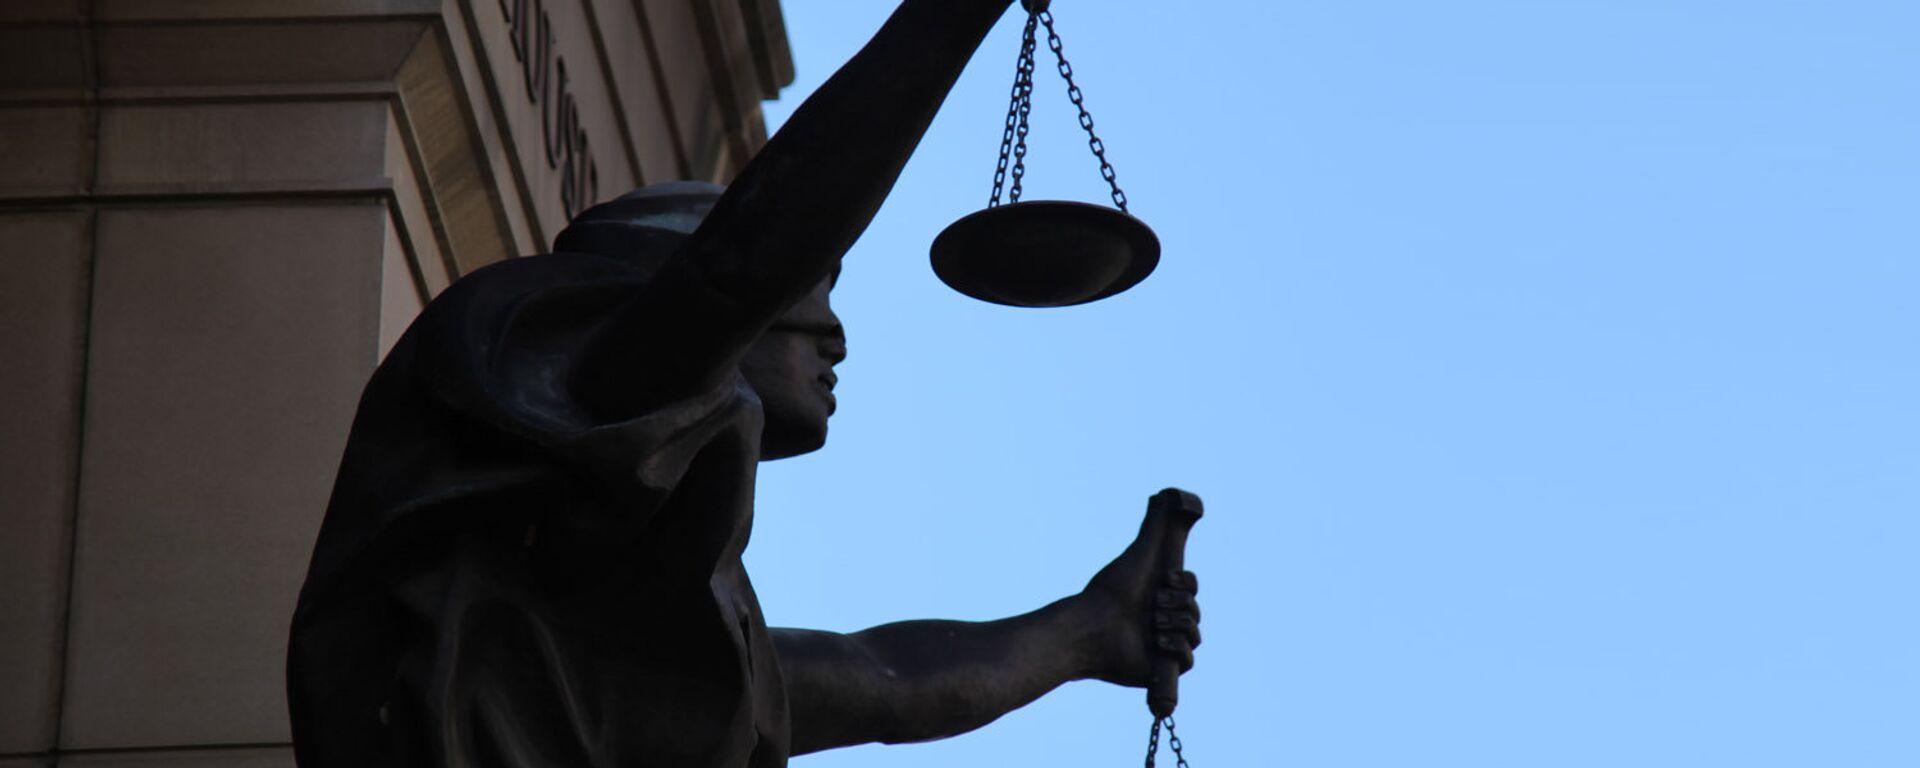 Una estatua de Justicia (imagen referencial) - Sputnik Mundo, 1920, 25.03.2021